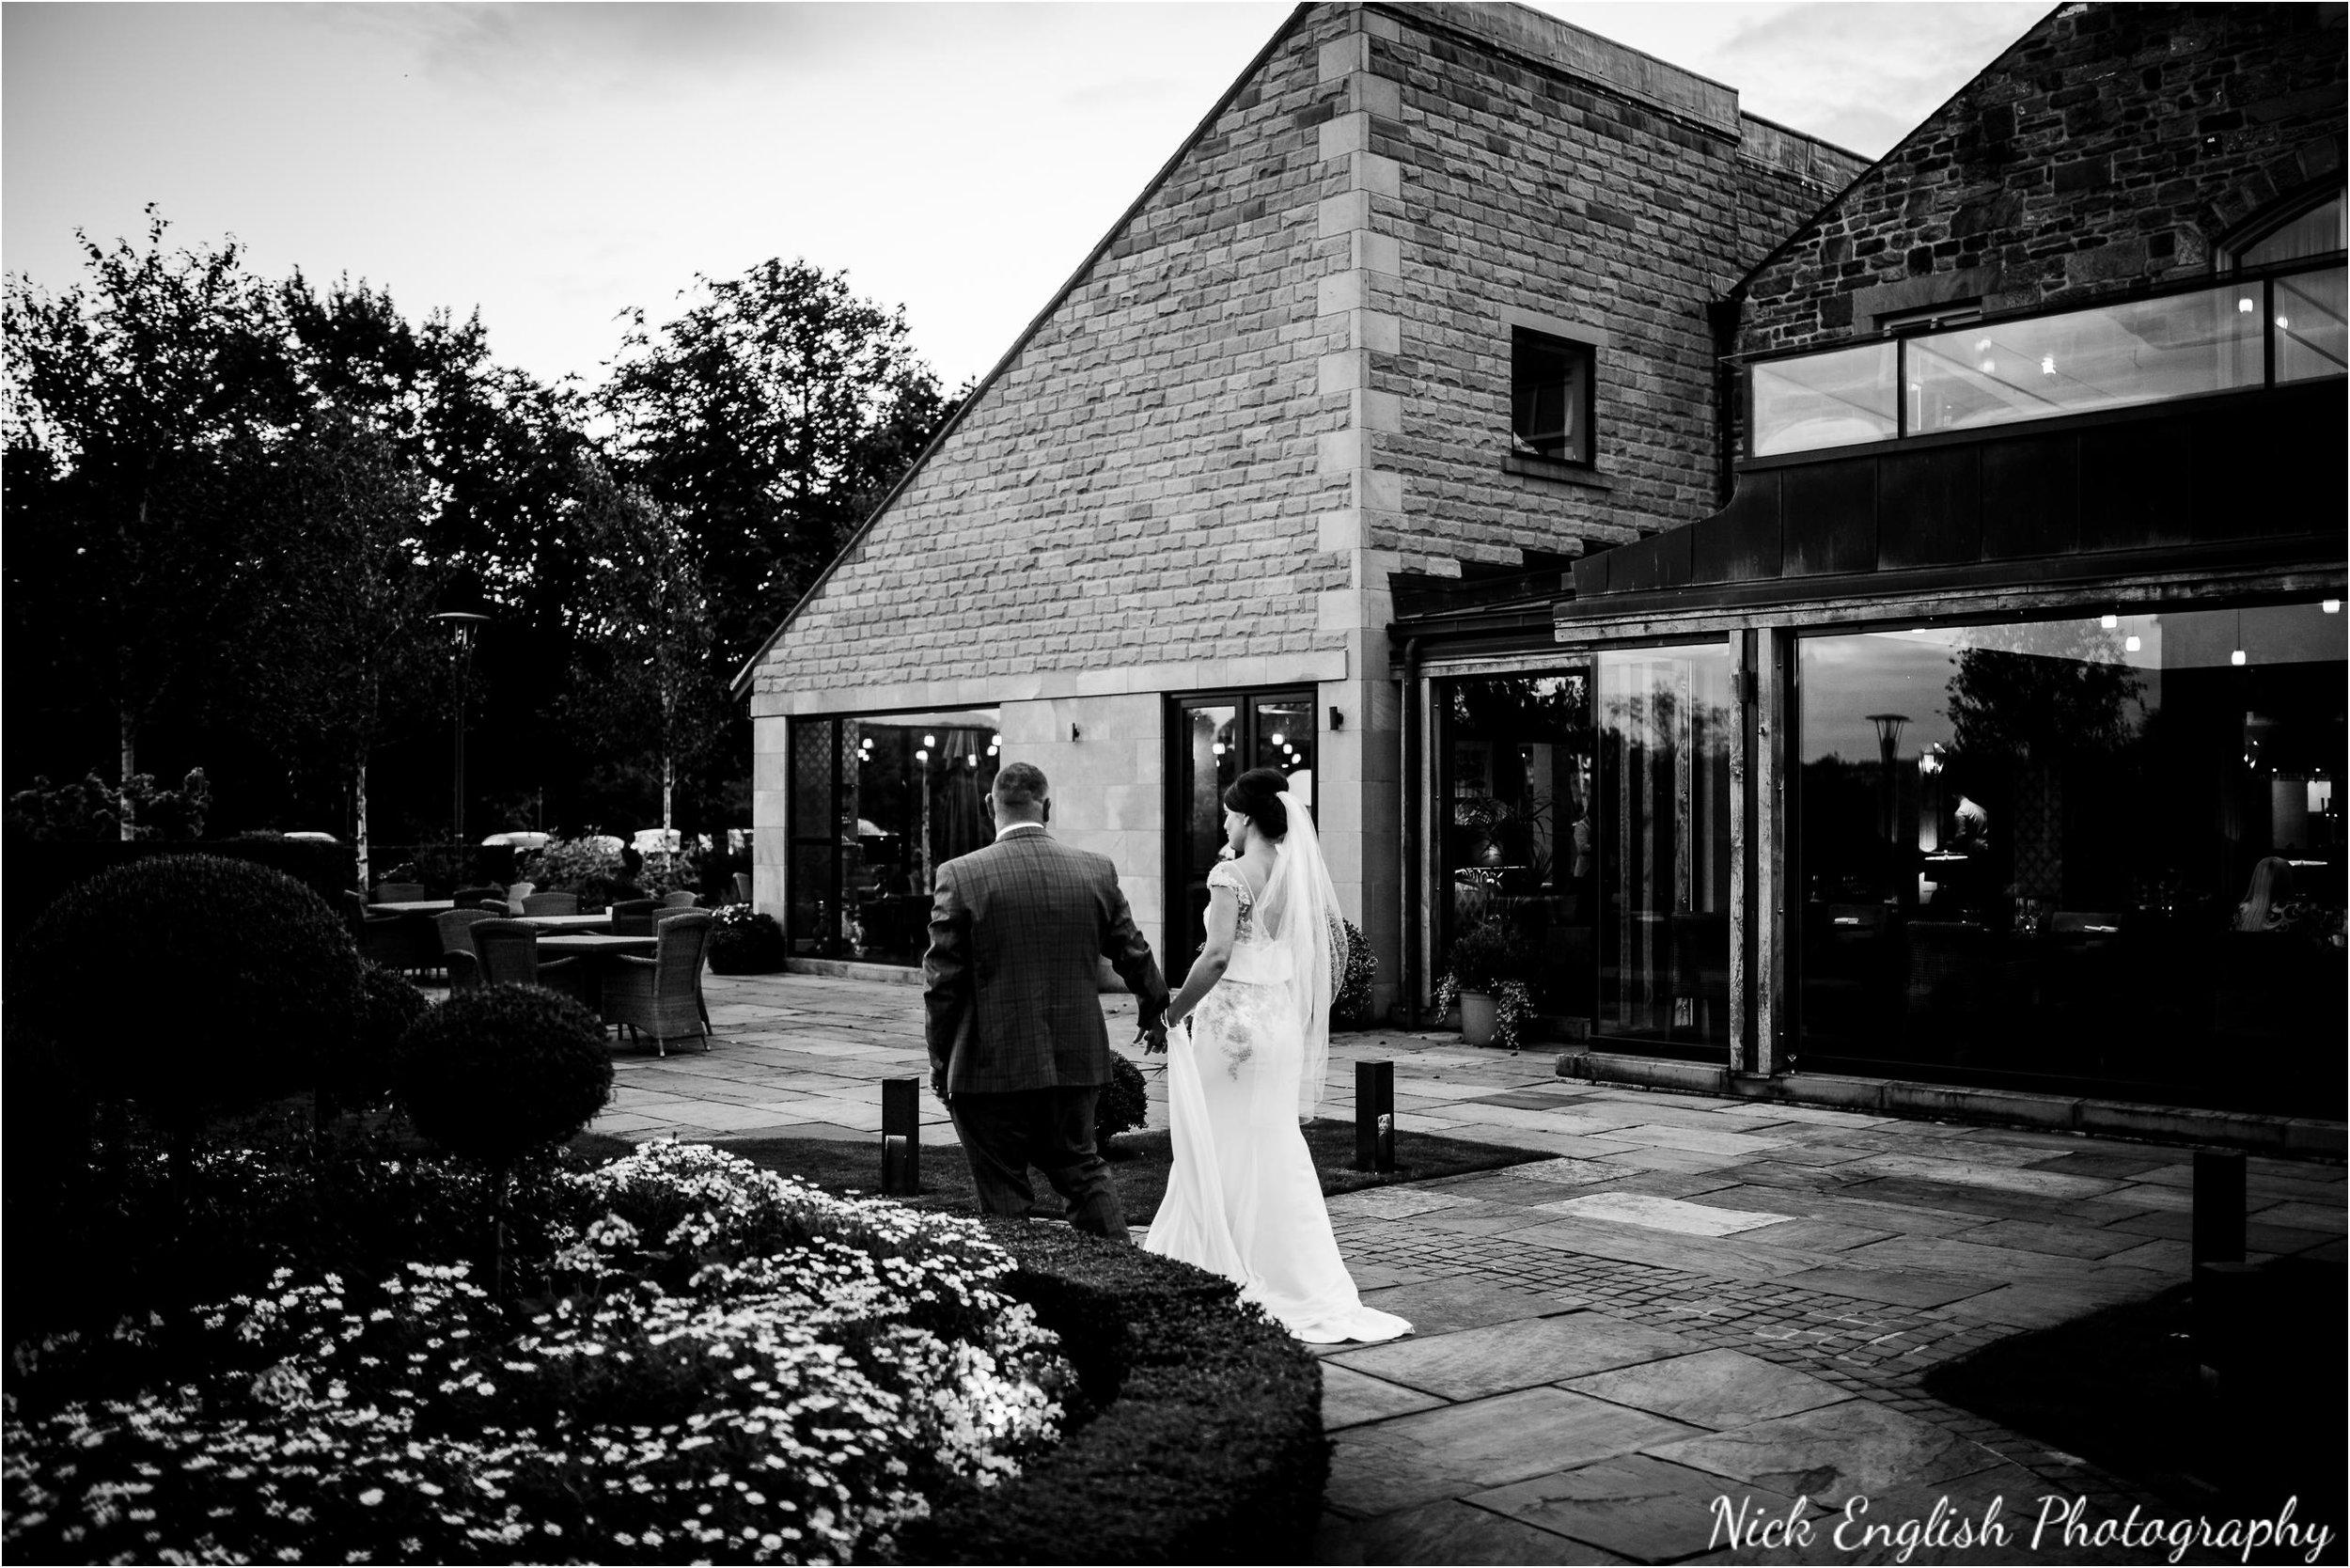 Stacey-Ash-Wedding-Photographs-Stanley-House-Preston-Lancashire-229.jpg